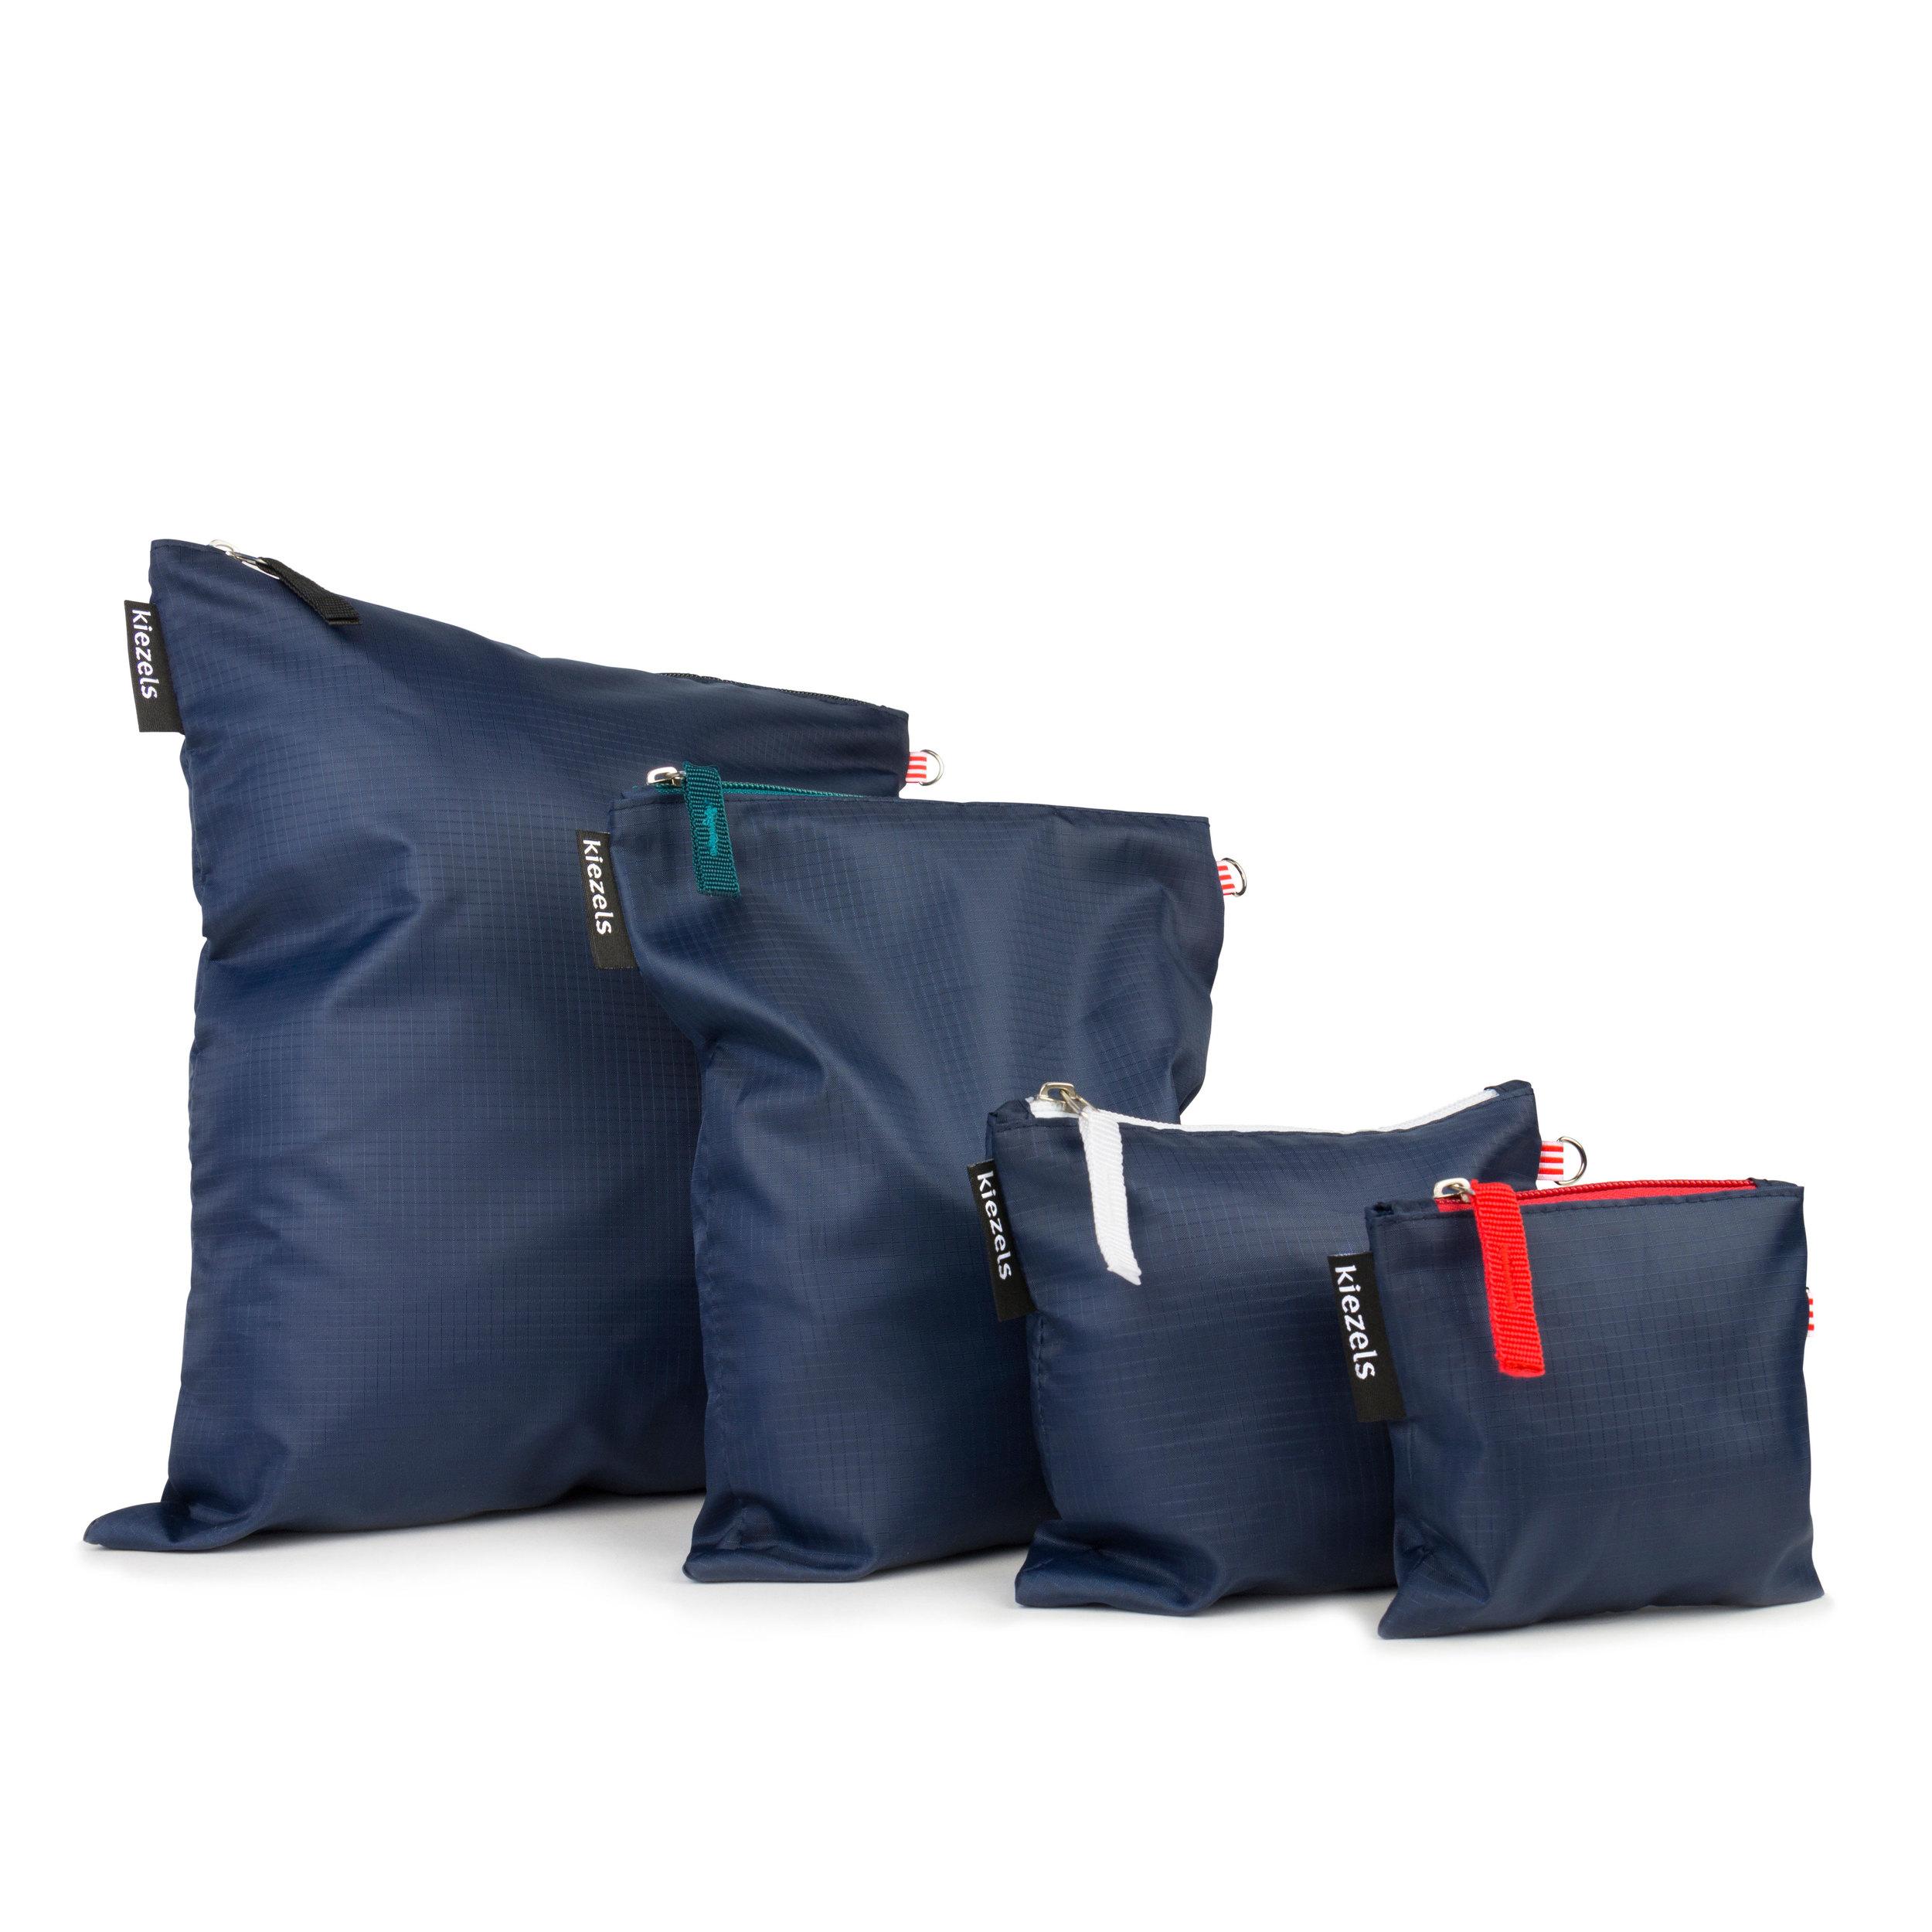 No. 204 Travel organiser bags - midnight blue € 18,50